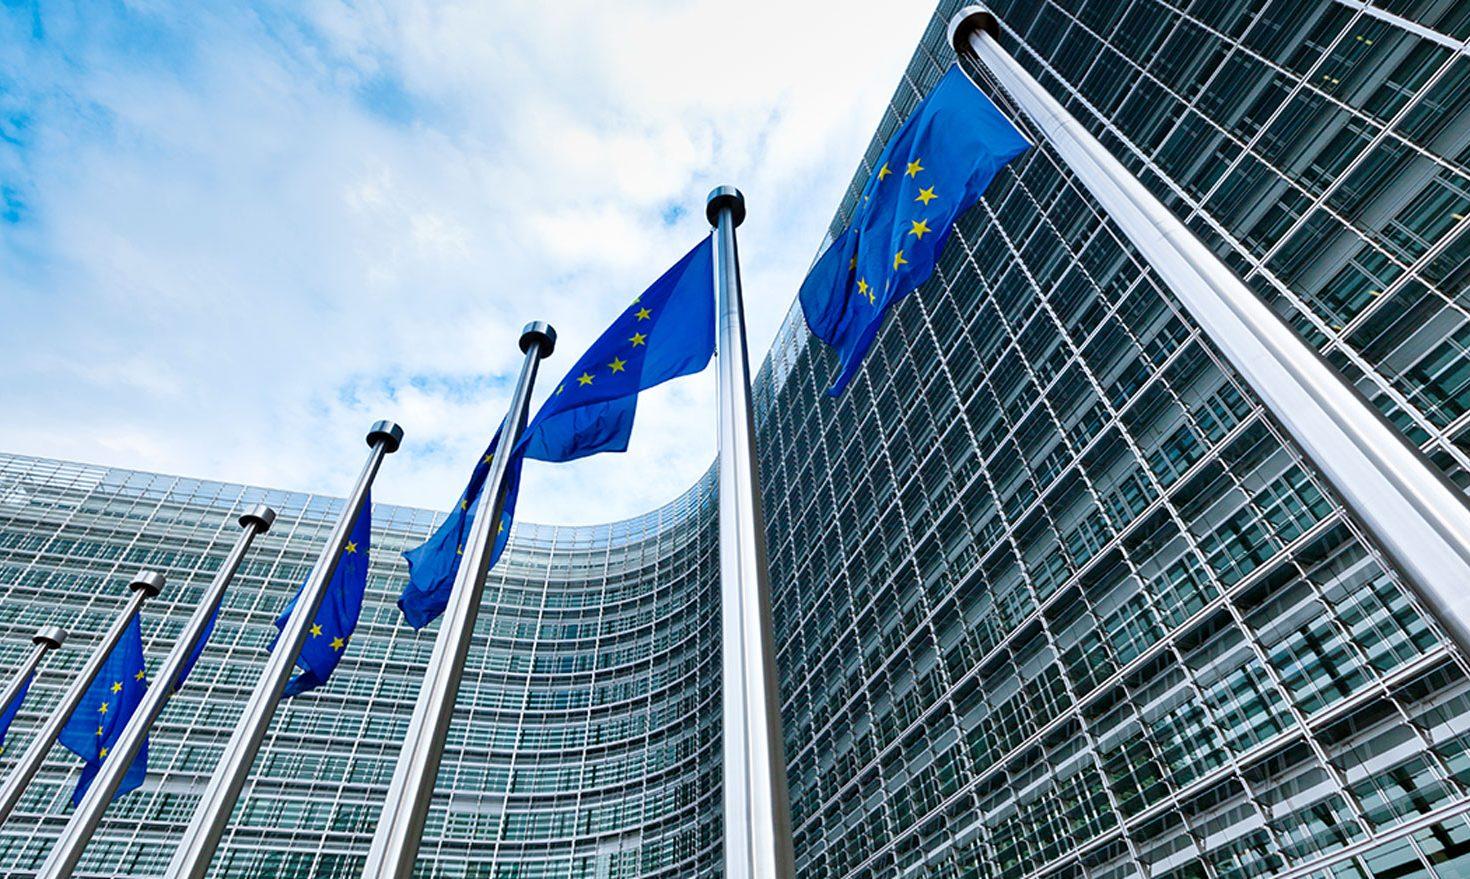 cib-eu-issues-13bn-sure-social-bond-to-further-mitigate-pandemic-impact